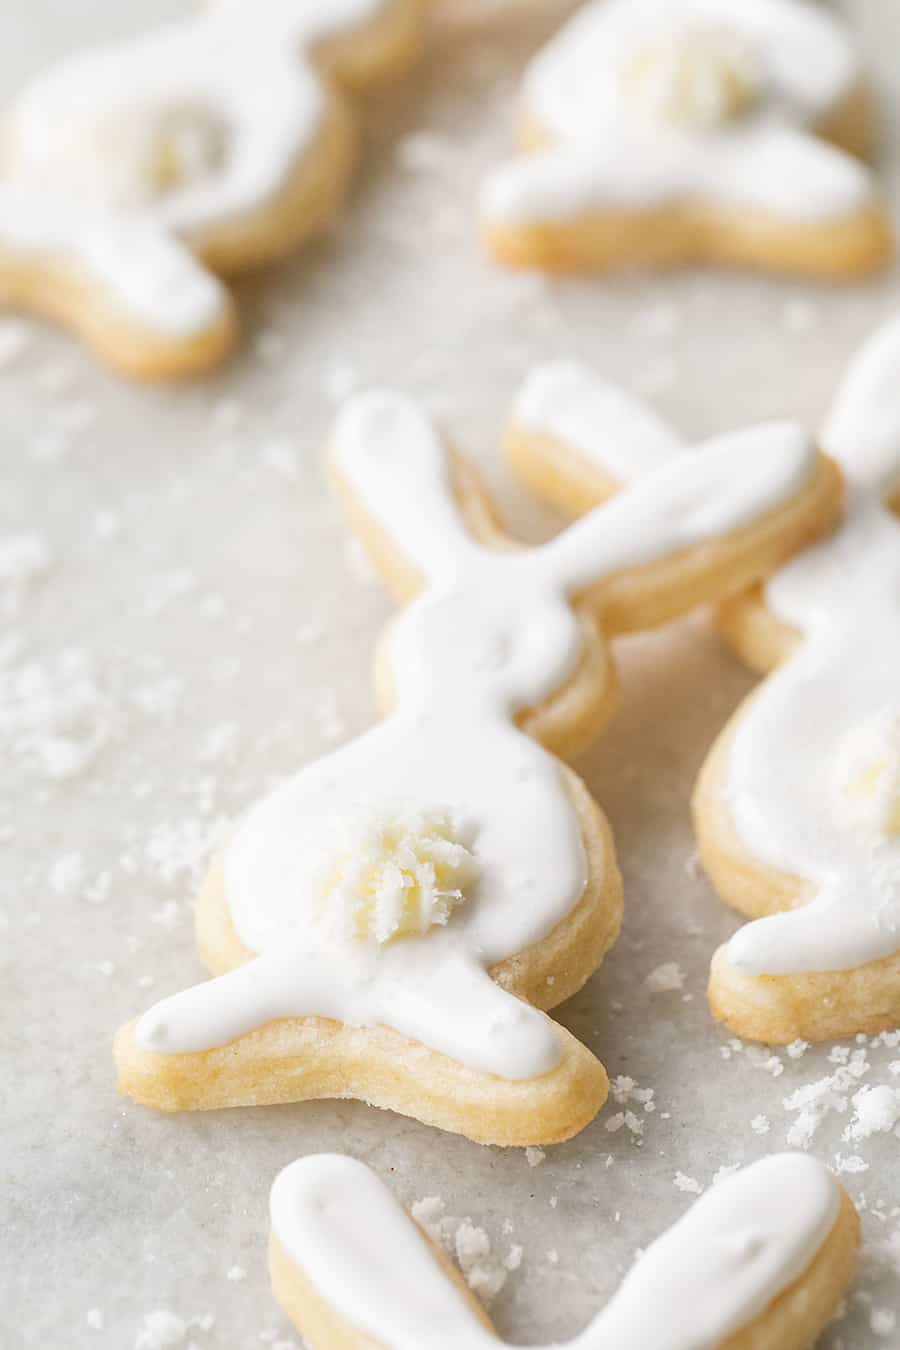 Bunny shaped sugar cookies